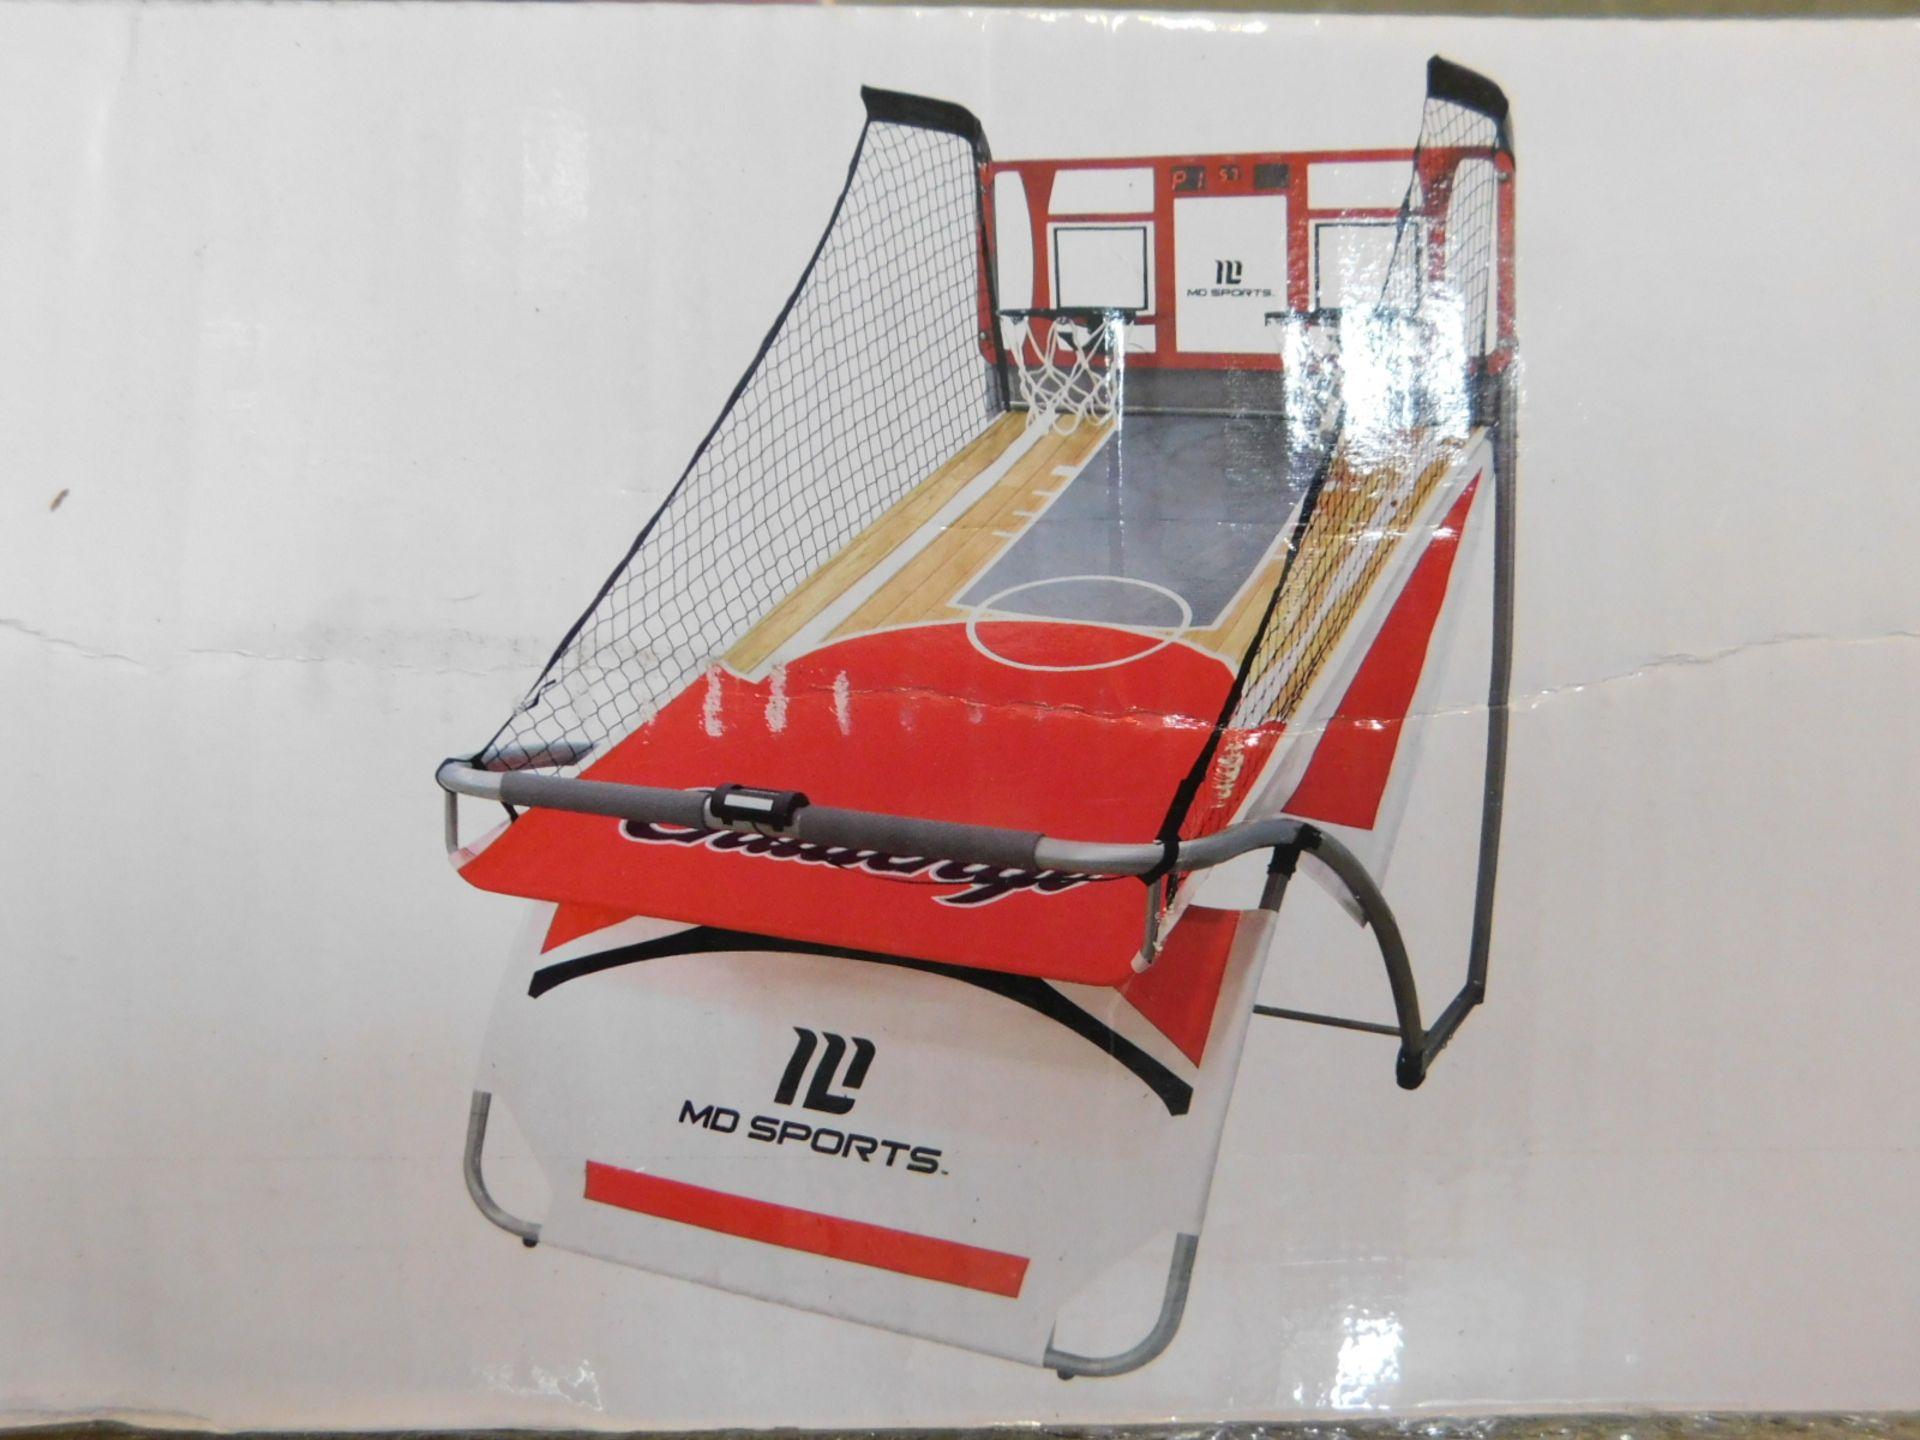 1 BOXED MD SPORTS EZ FOLD DUAL SHOT ARCADE BASKETBALL GAME RRP £179.99